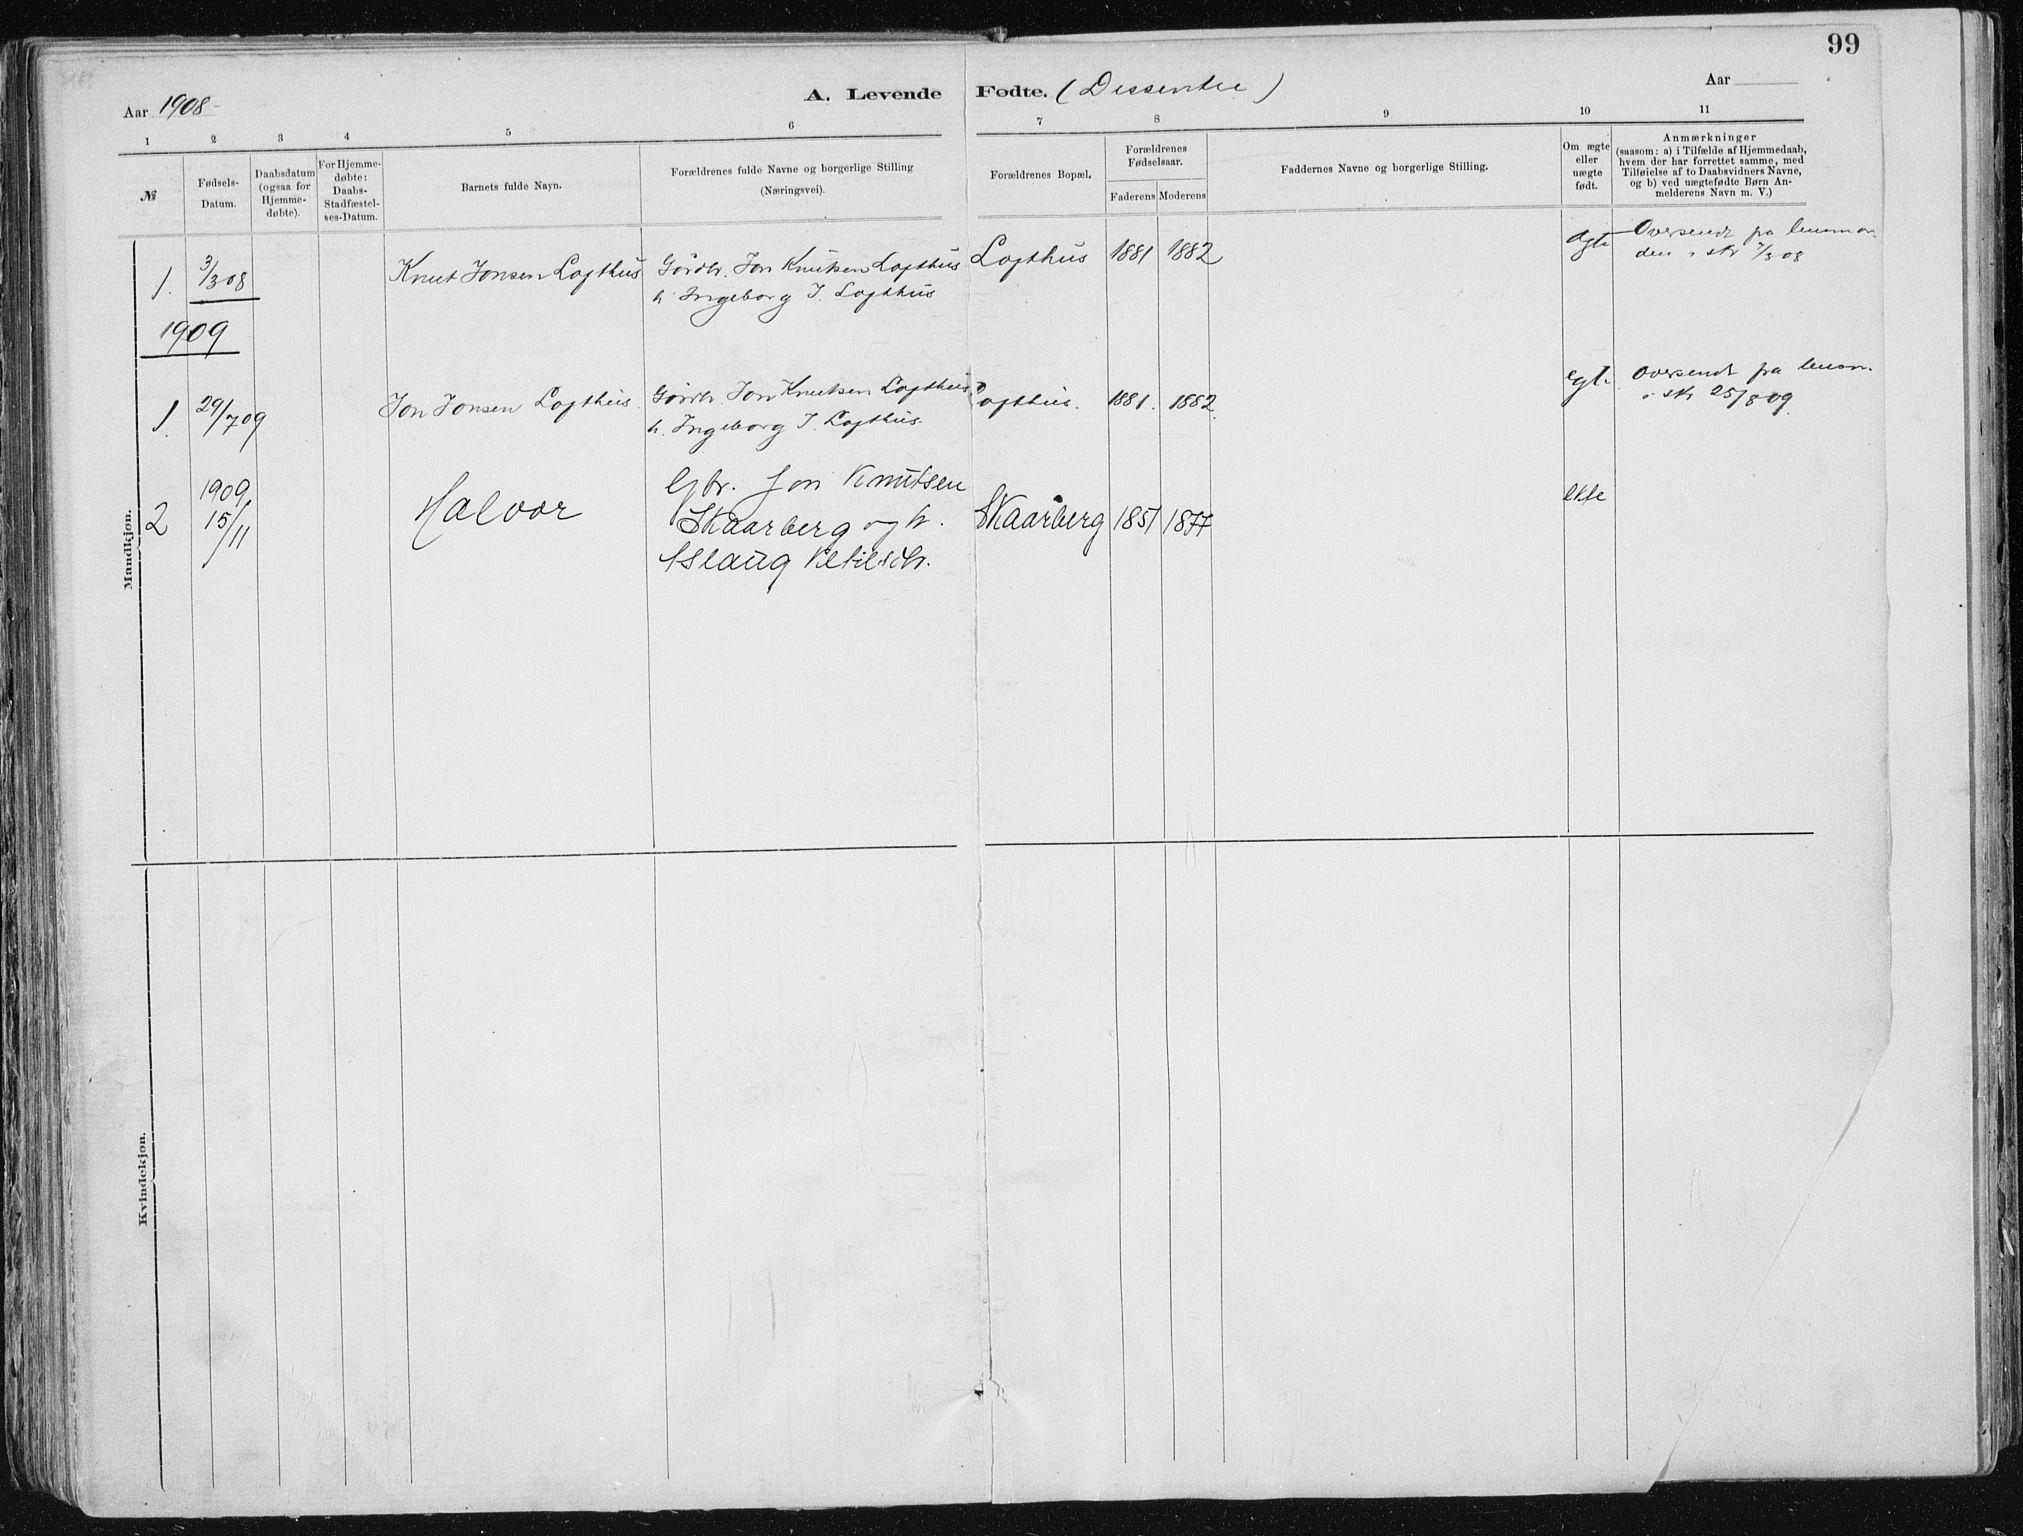 SAKO, Tinn kirkebøker, F/Fa/L0007: Ministerialbok nr. I 7, 1878-1922, s. 99